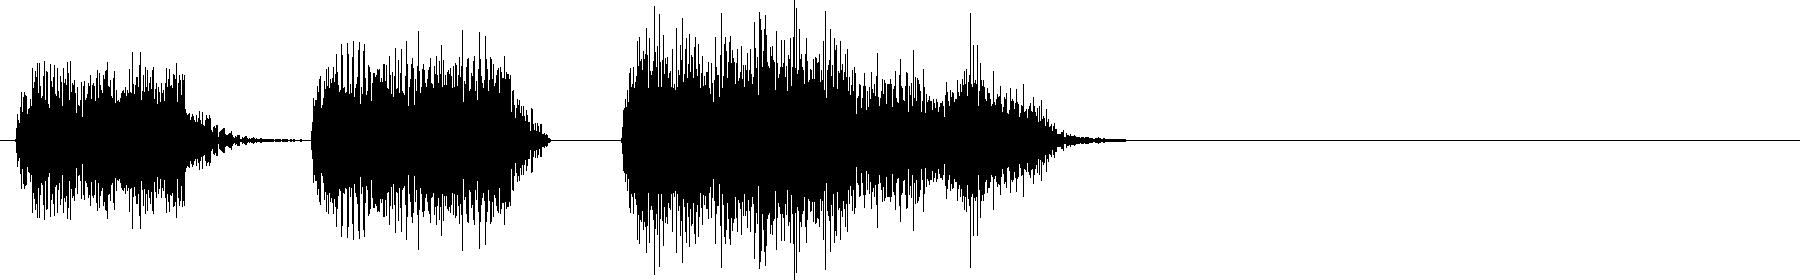 vocal fx   naming drum and bass genre 170 bpm